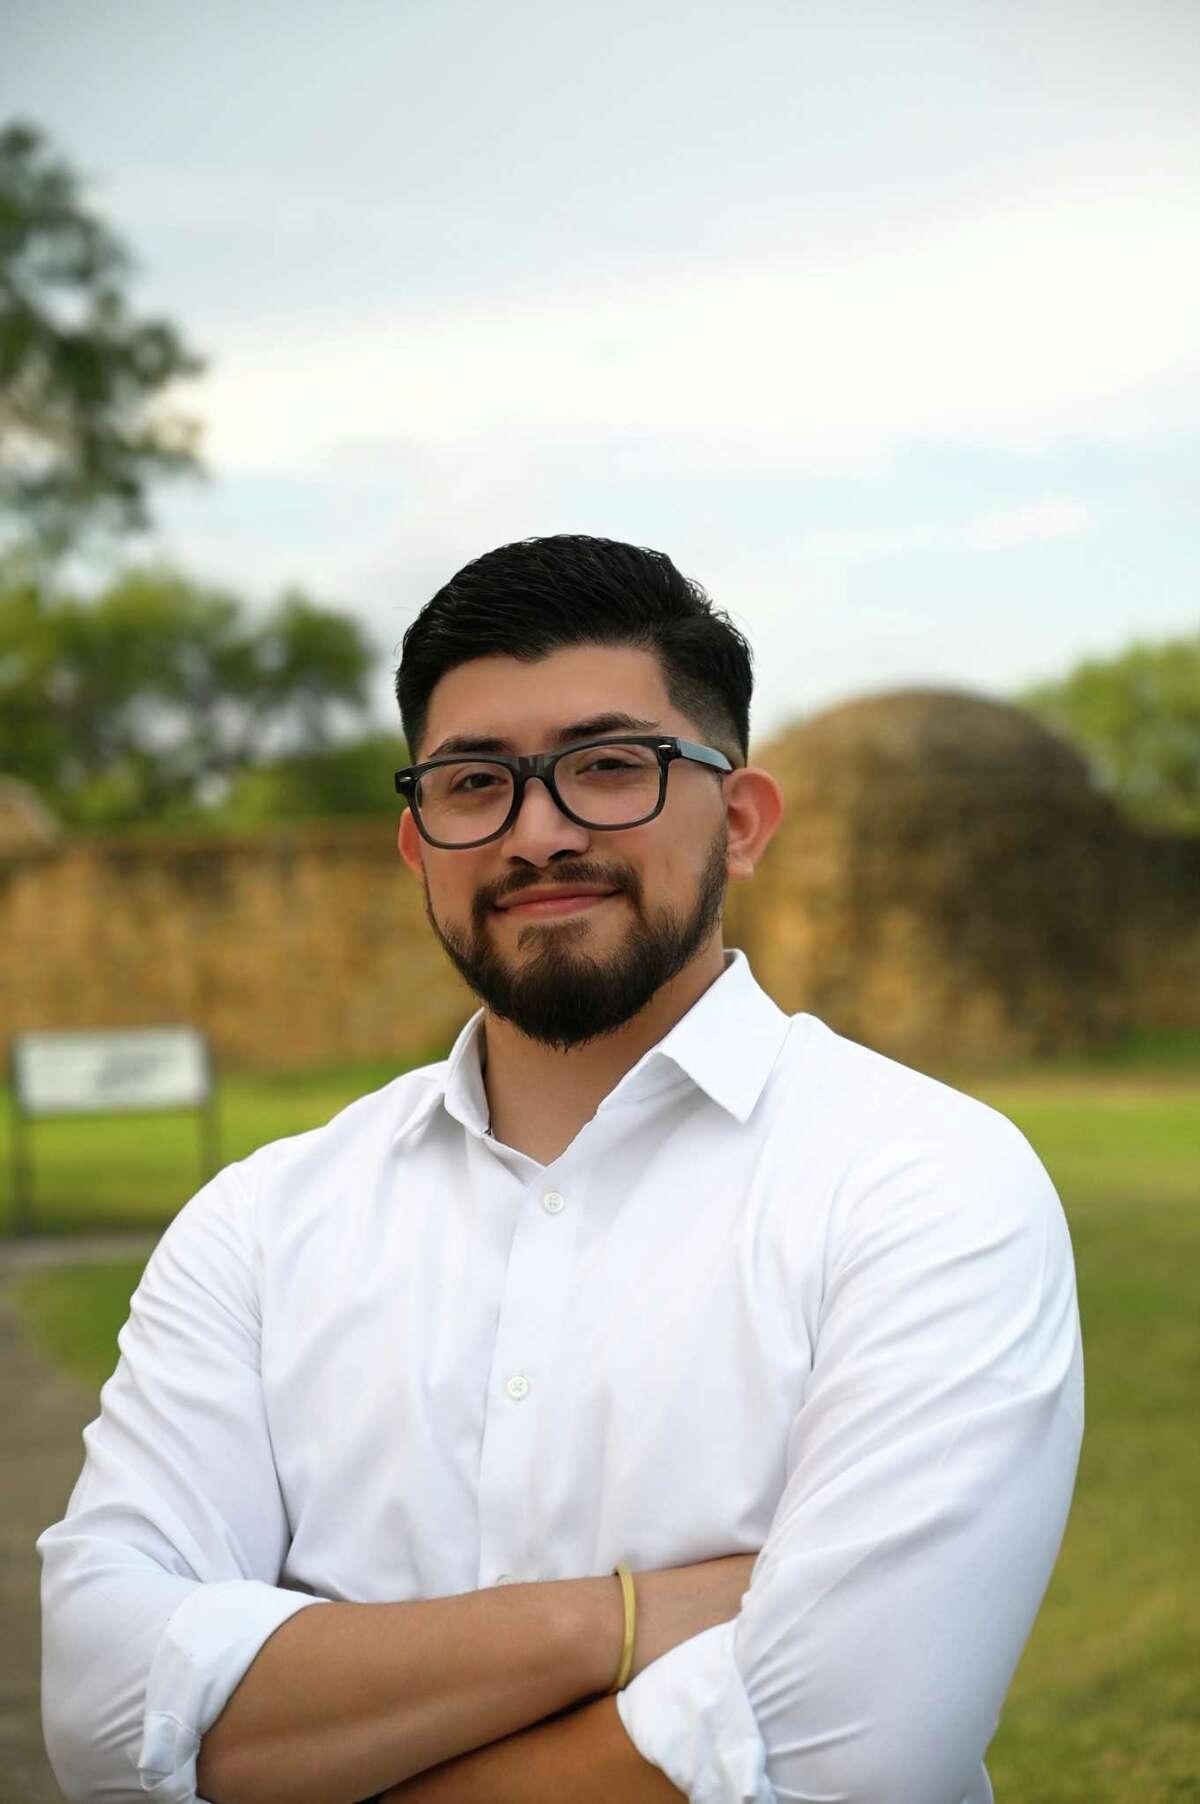 Frank Ramirez, a staff member of San Antonio City Councilwoman Ana Sandoval, is one of three Democrats hoping to represent House District 118 in San Antonio.